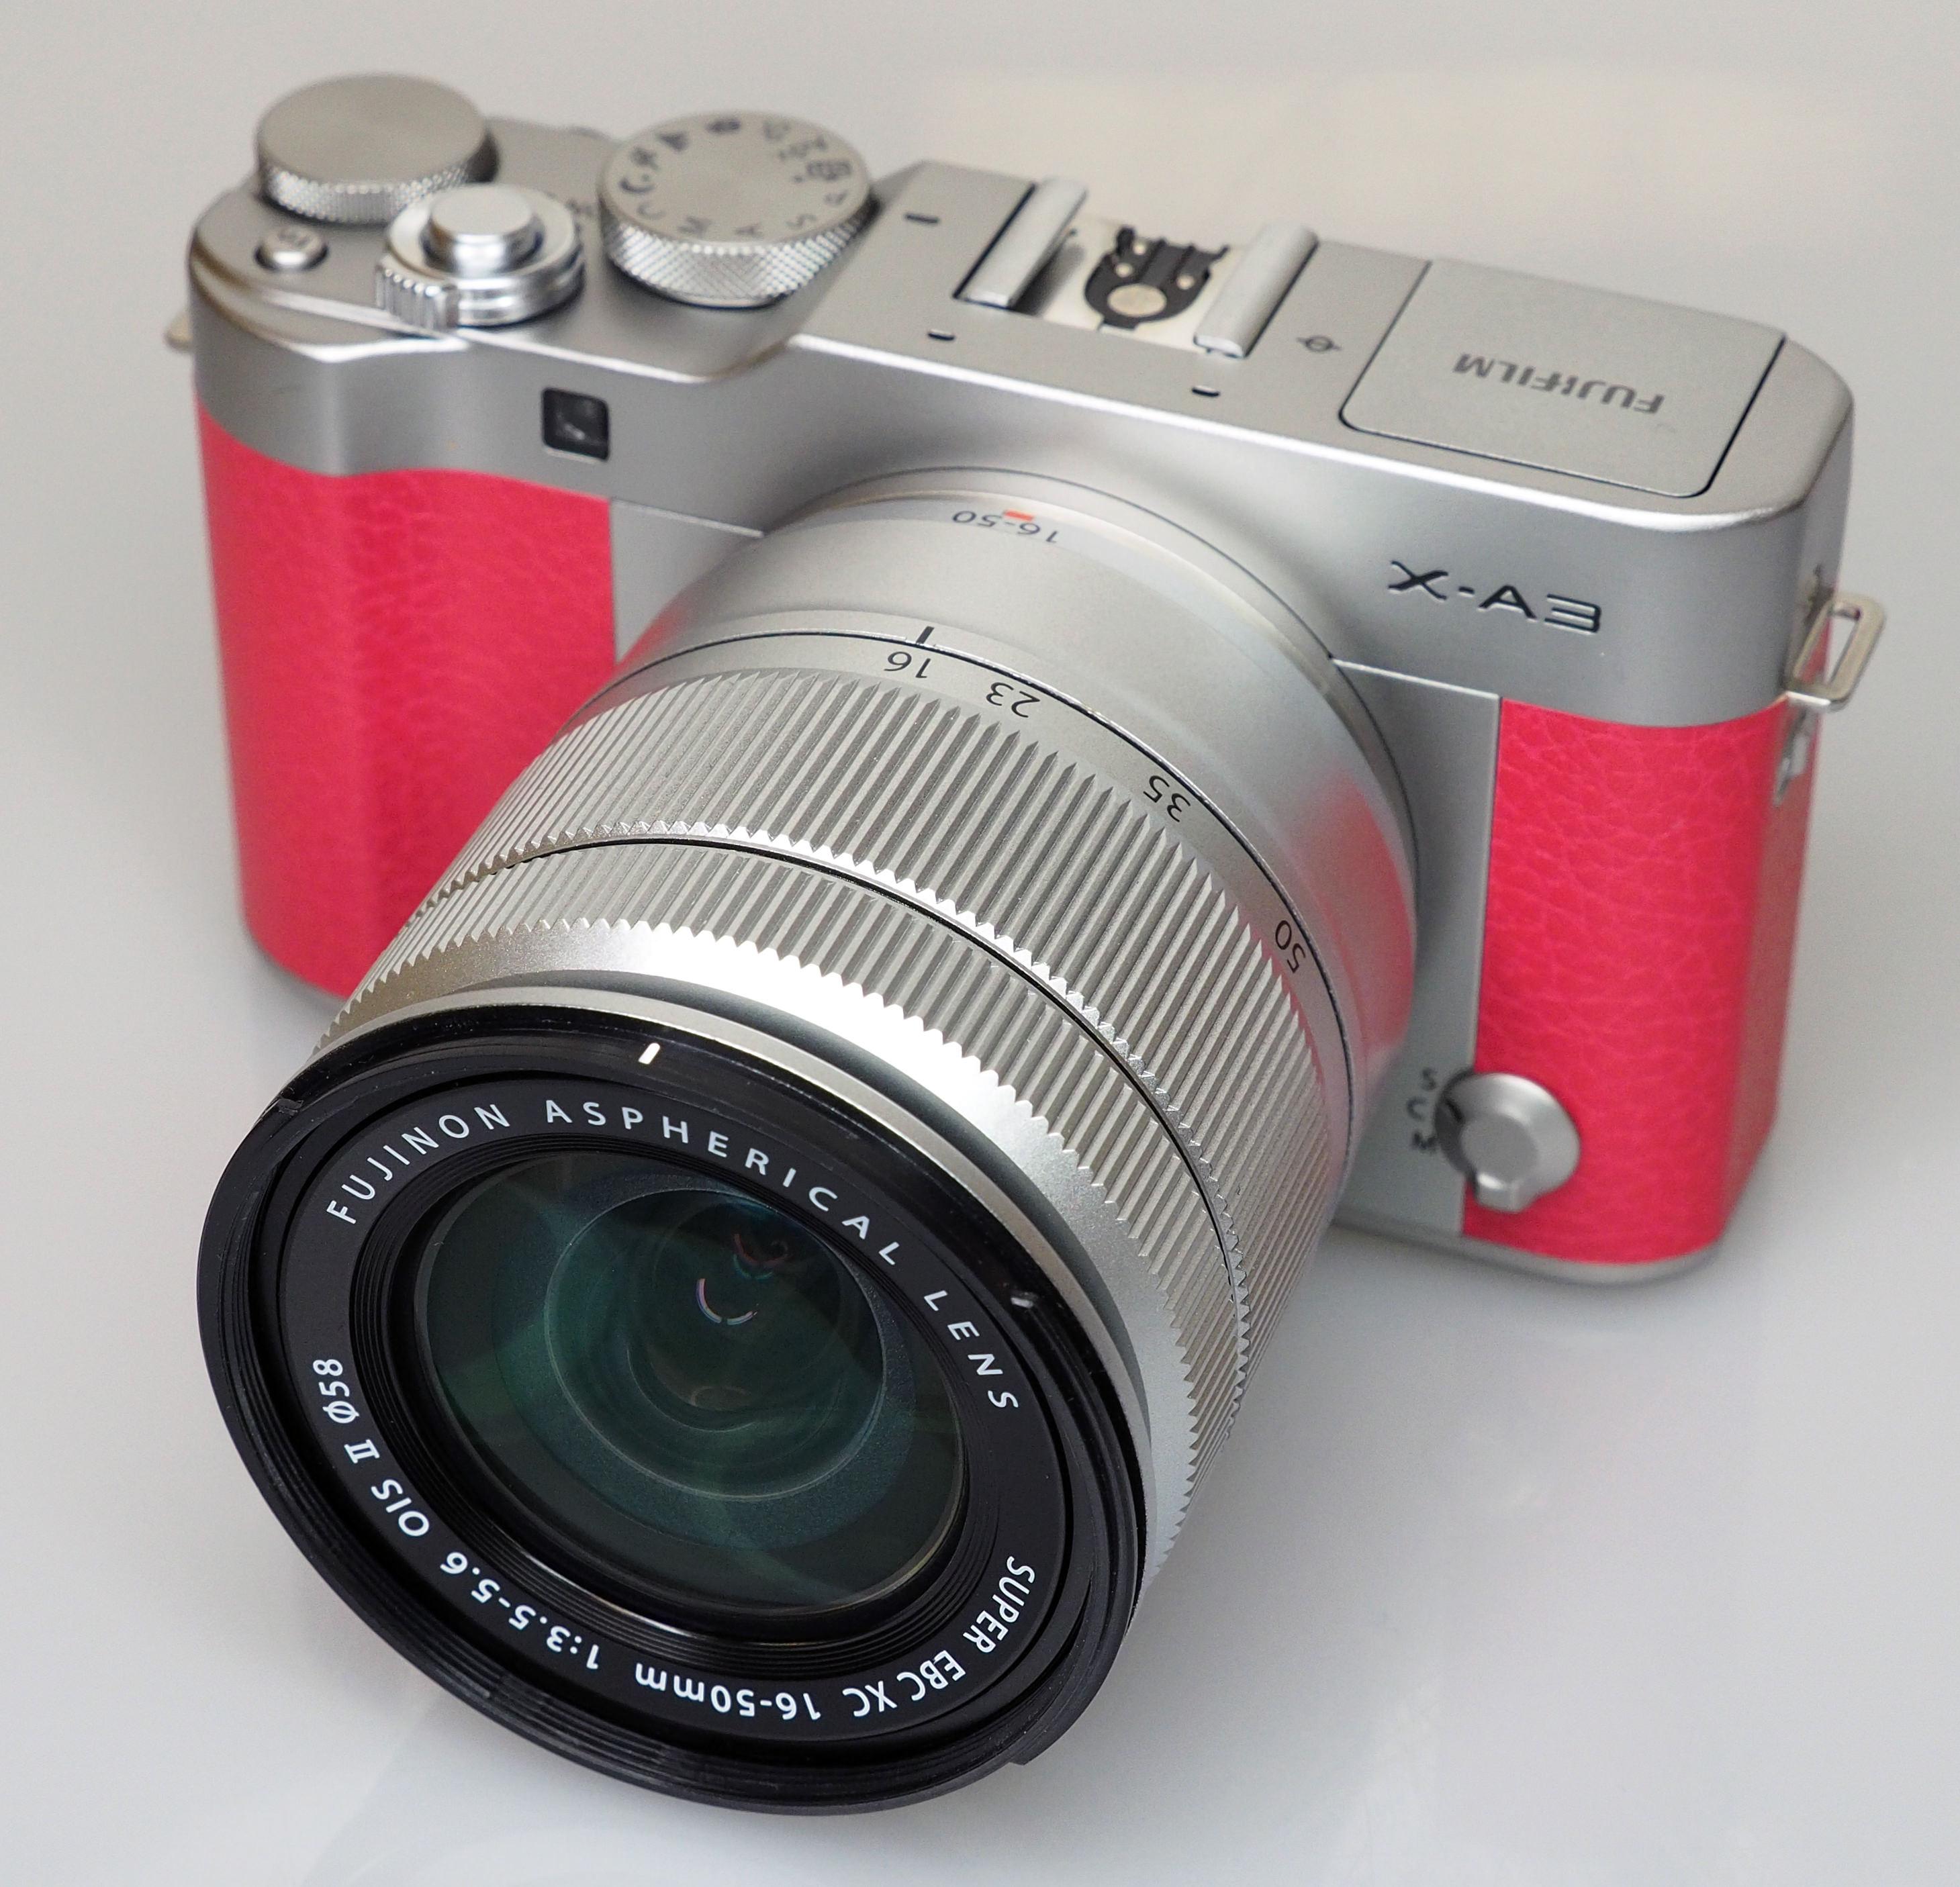 Fujifilm X-A3 Review | ePHOTOzine